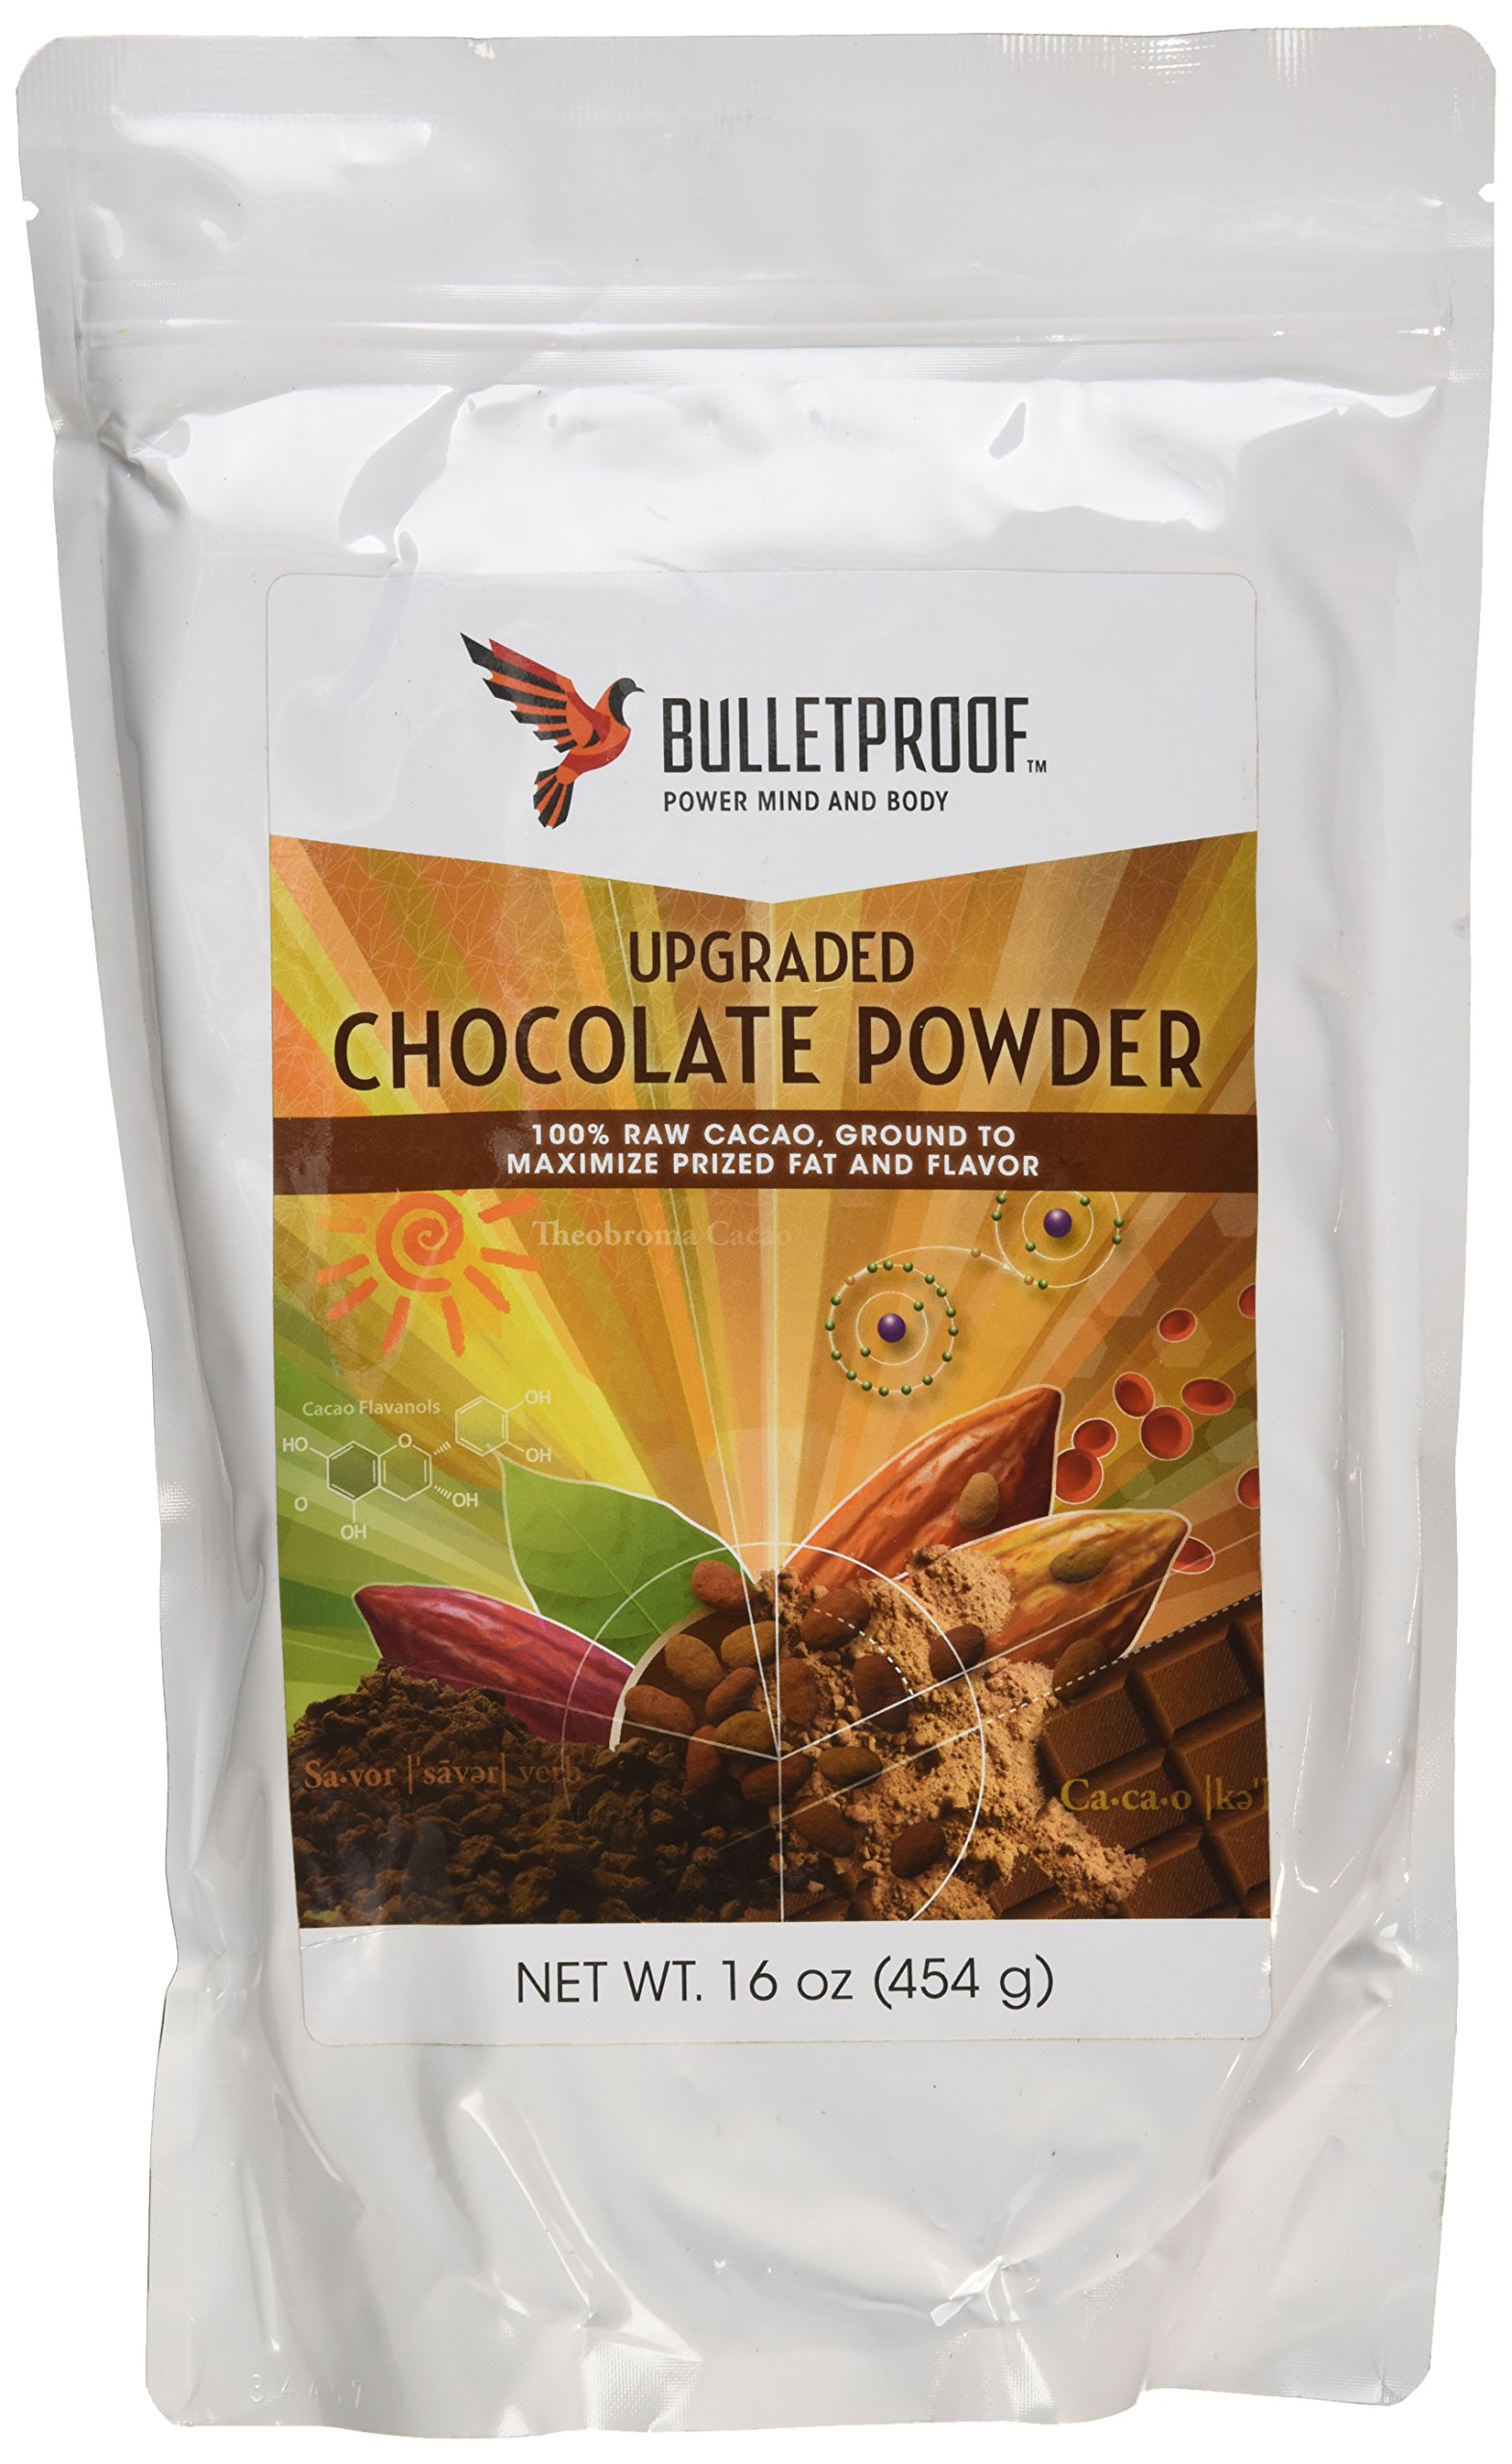 Bulletproof Chocolate Powder 16 oz